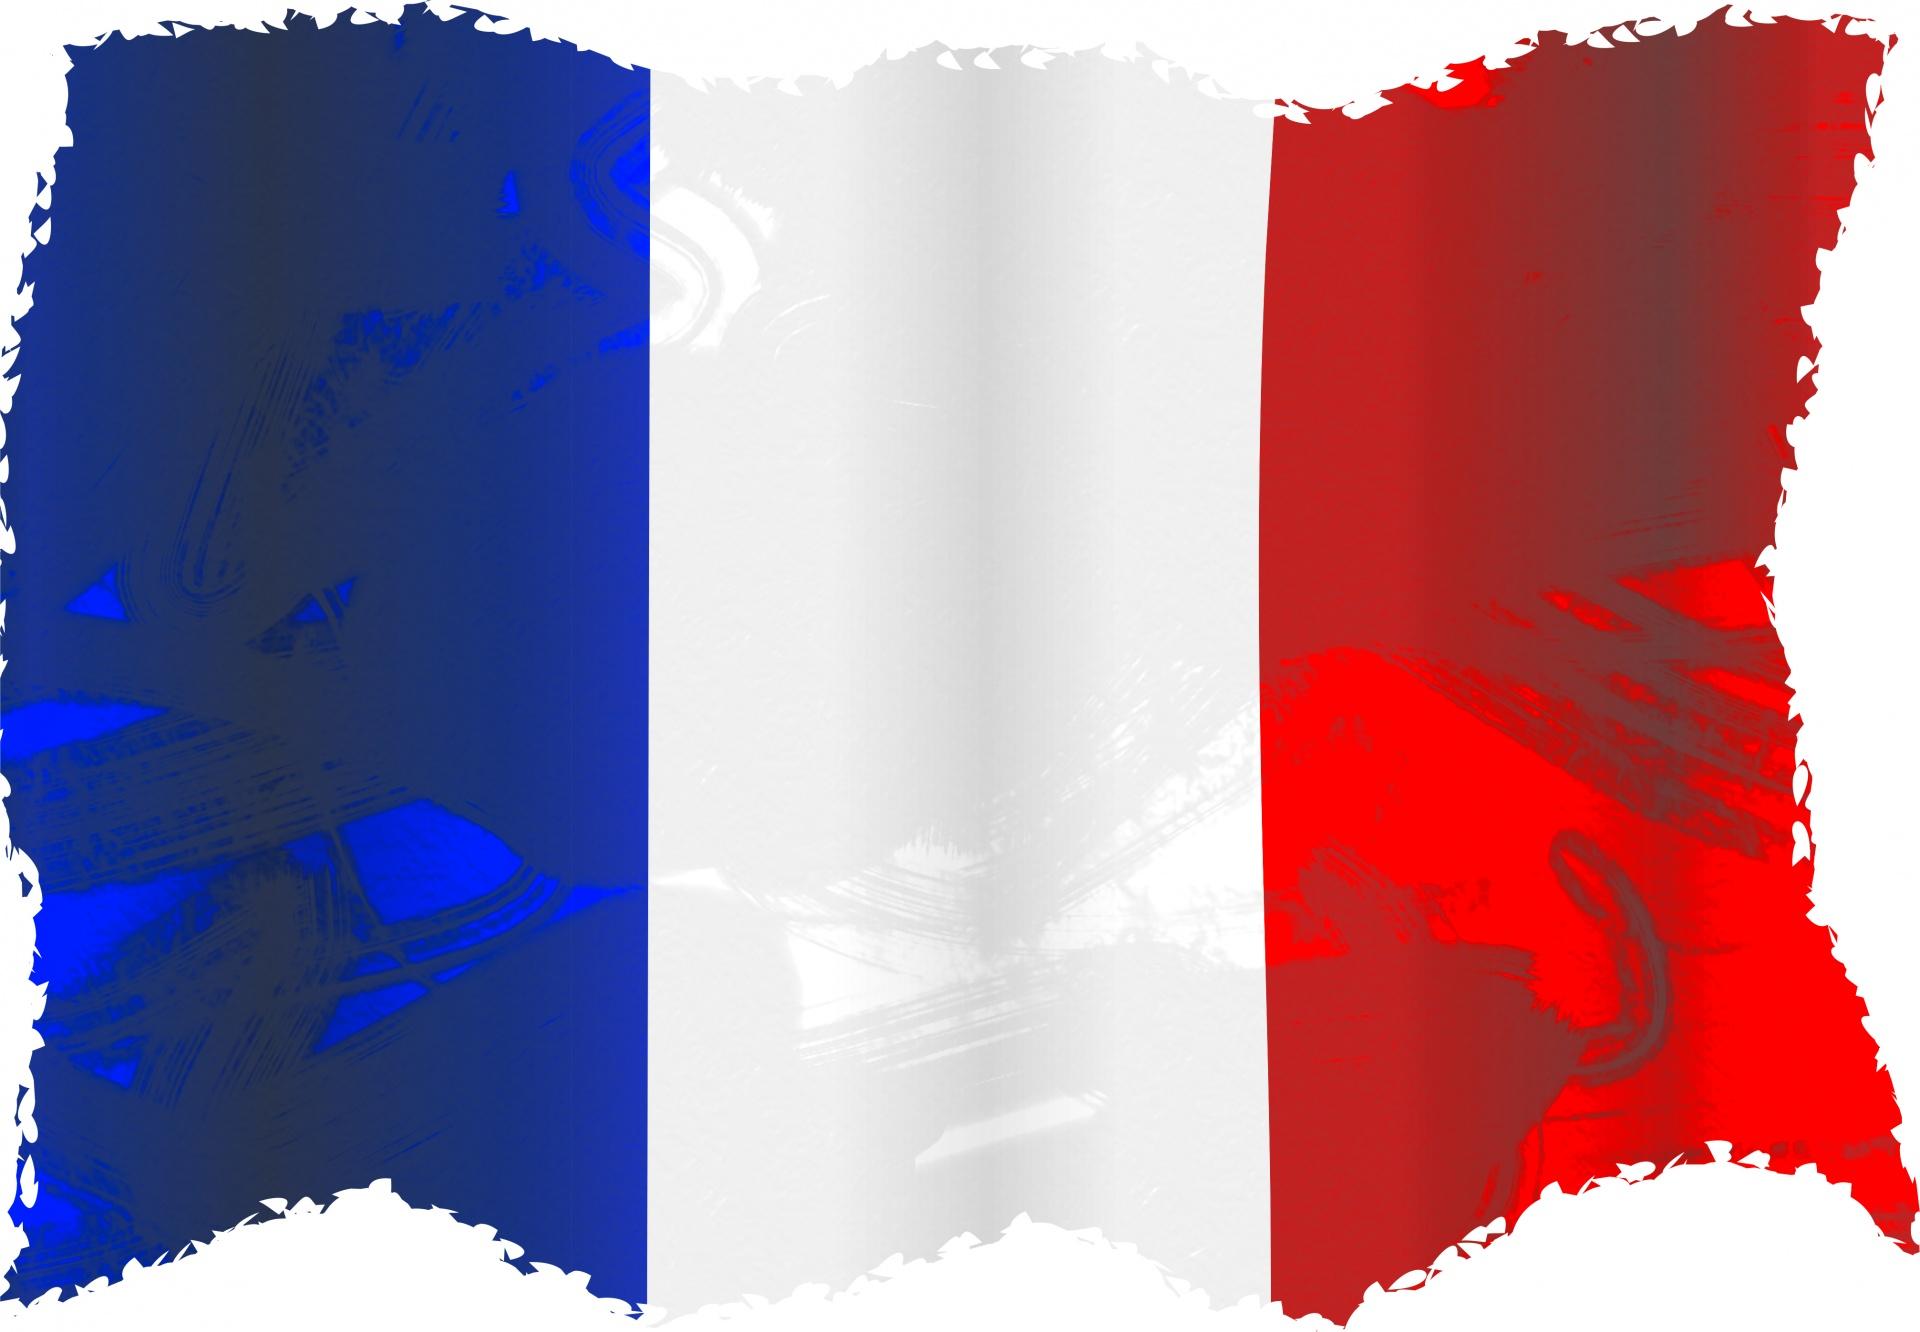 3d Animated Gif Wallpaper For Mobile French Flag Hd Backgrounds Pixelstalk Net